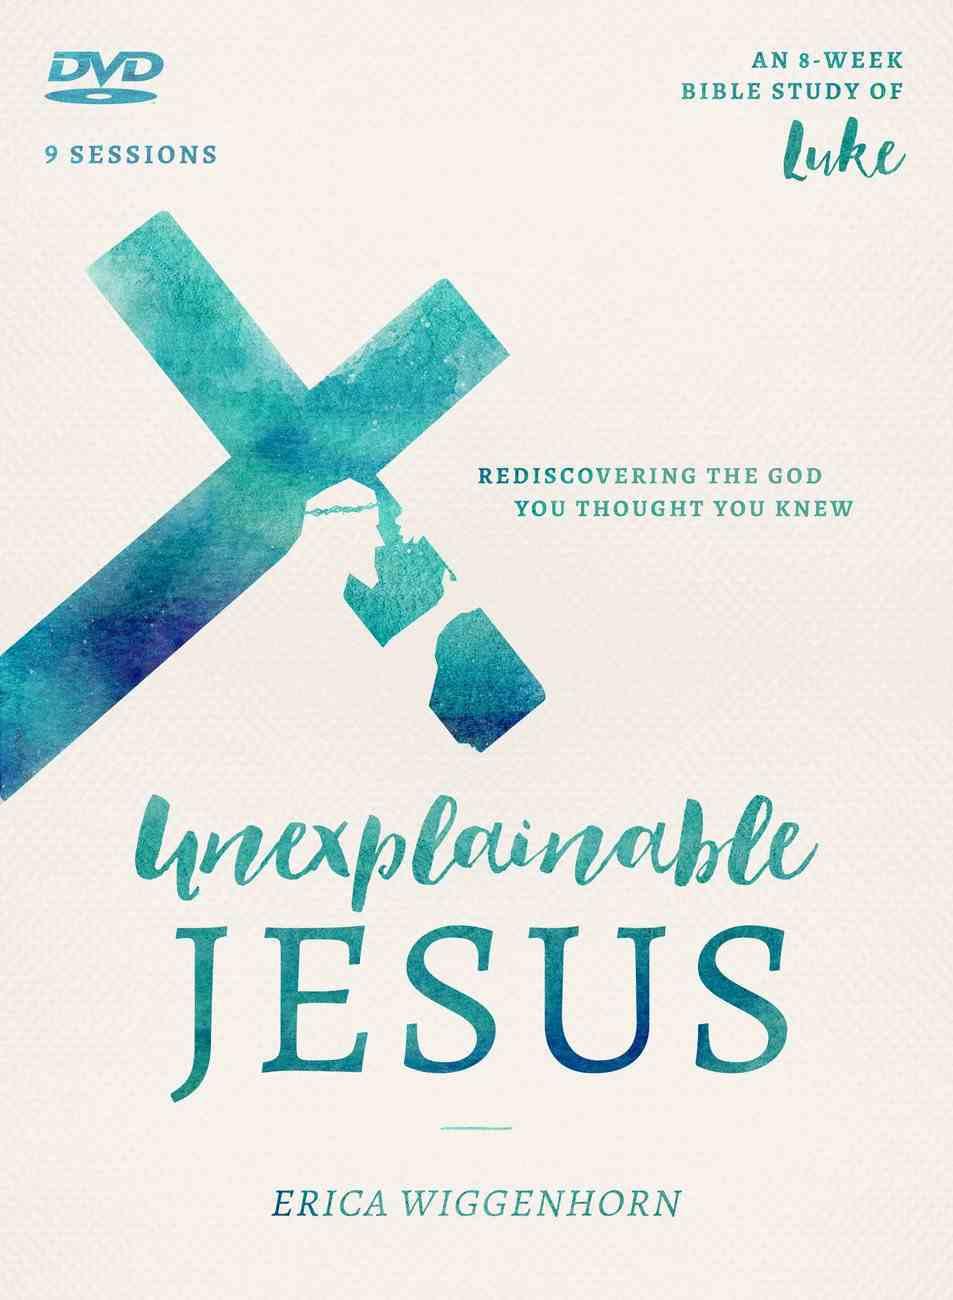 The Unexplainable Jesus (Dvd) DVD